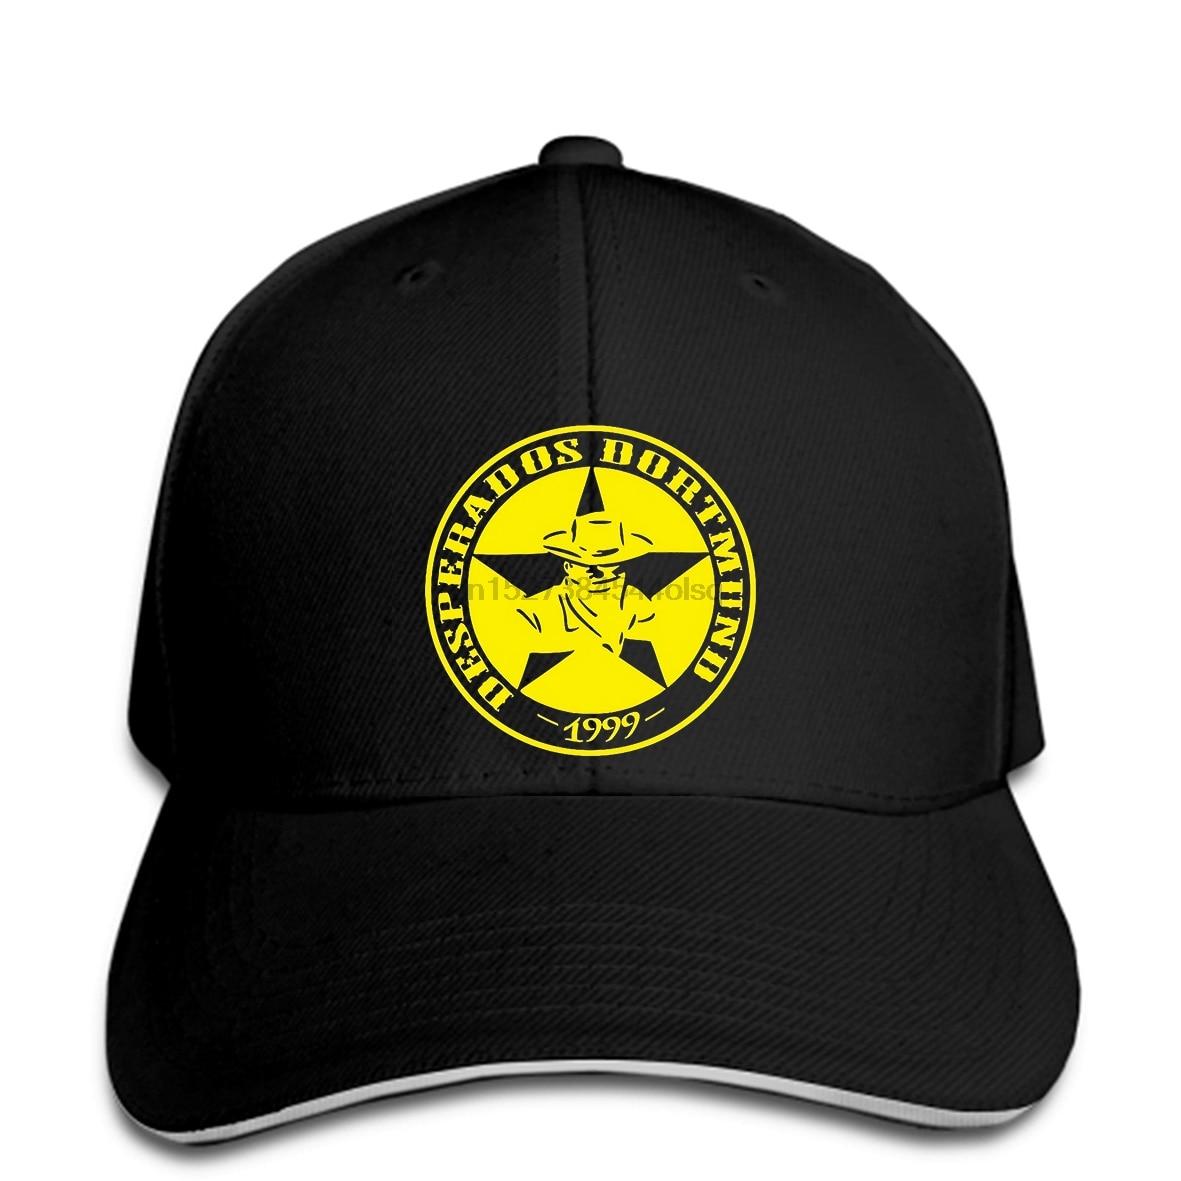 Baseball Cap Bukaneros Baseball Caps Rayo Vallecano Rvm Vallekas Footballer Ultras Antifa Punks Aliexpress Com Imall Com